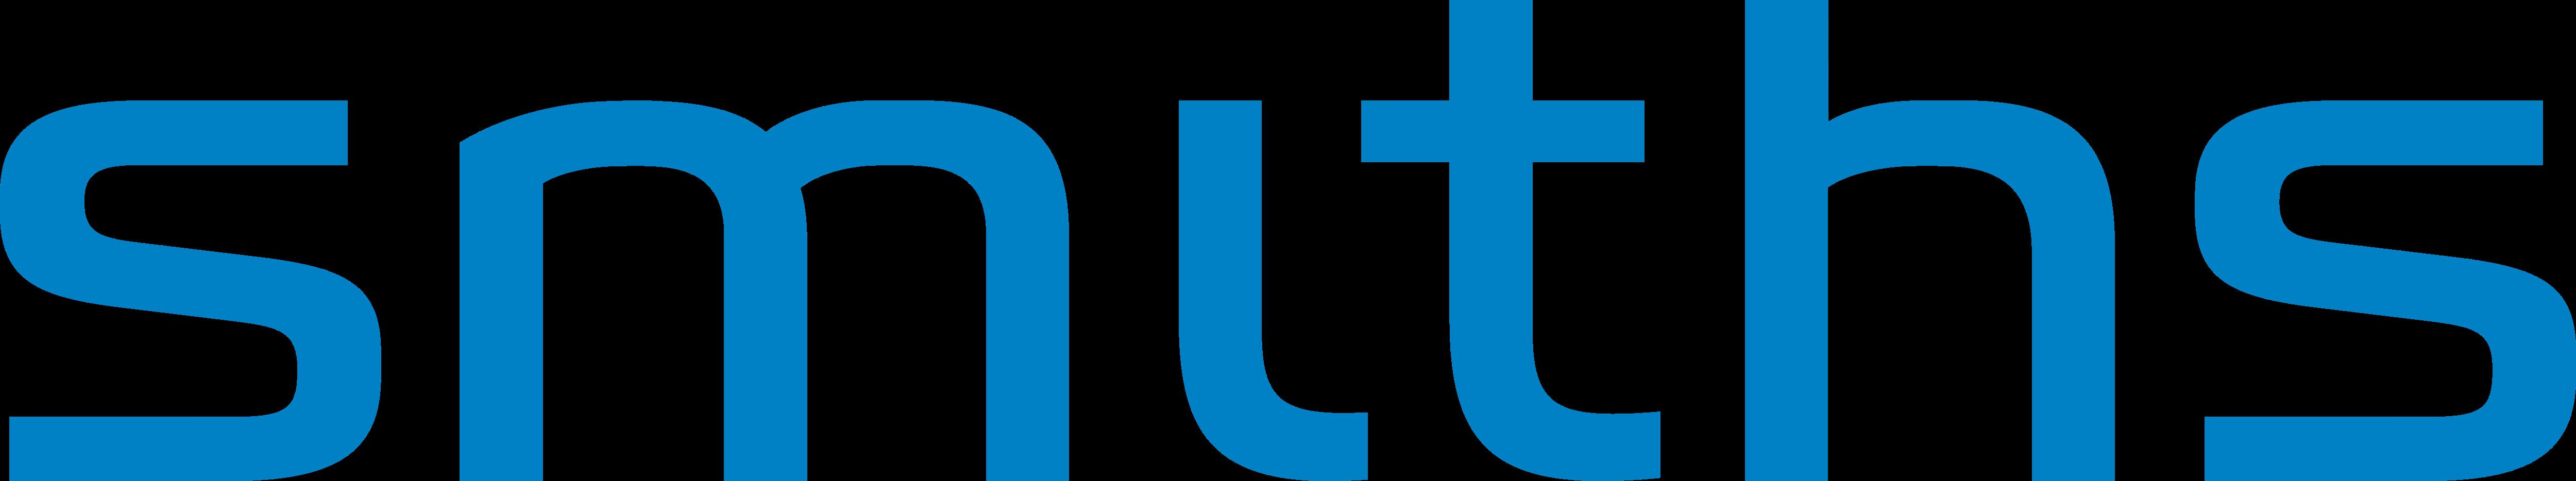 SMGZY logo